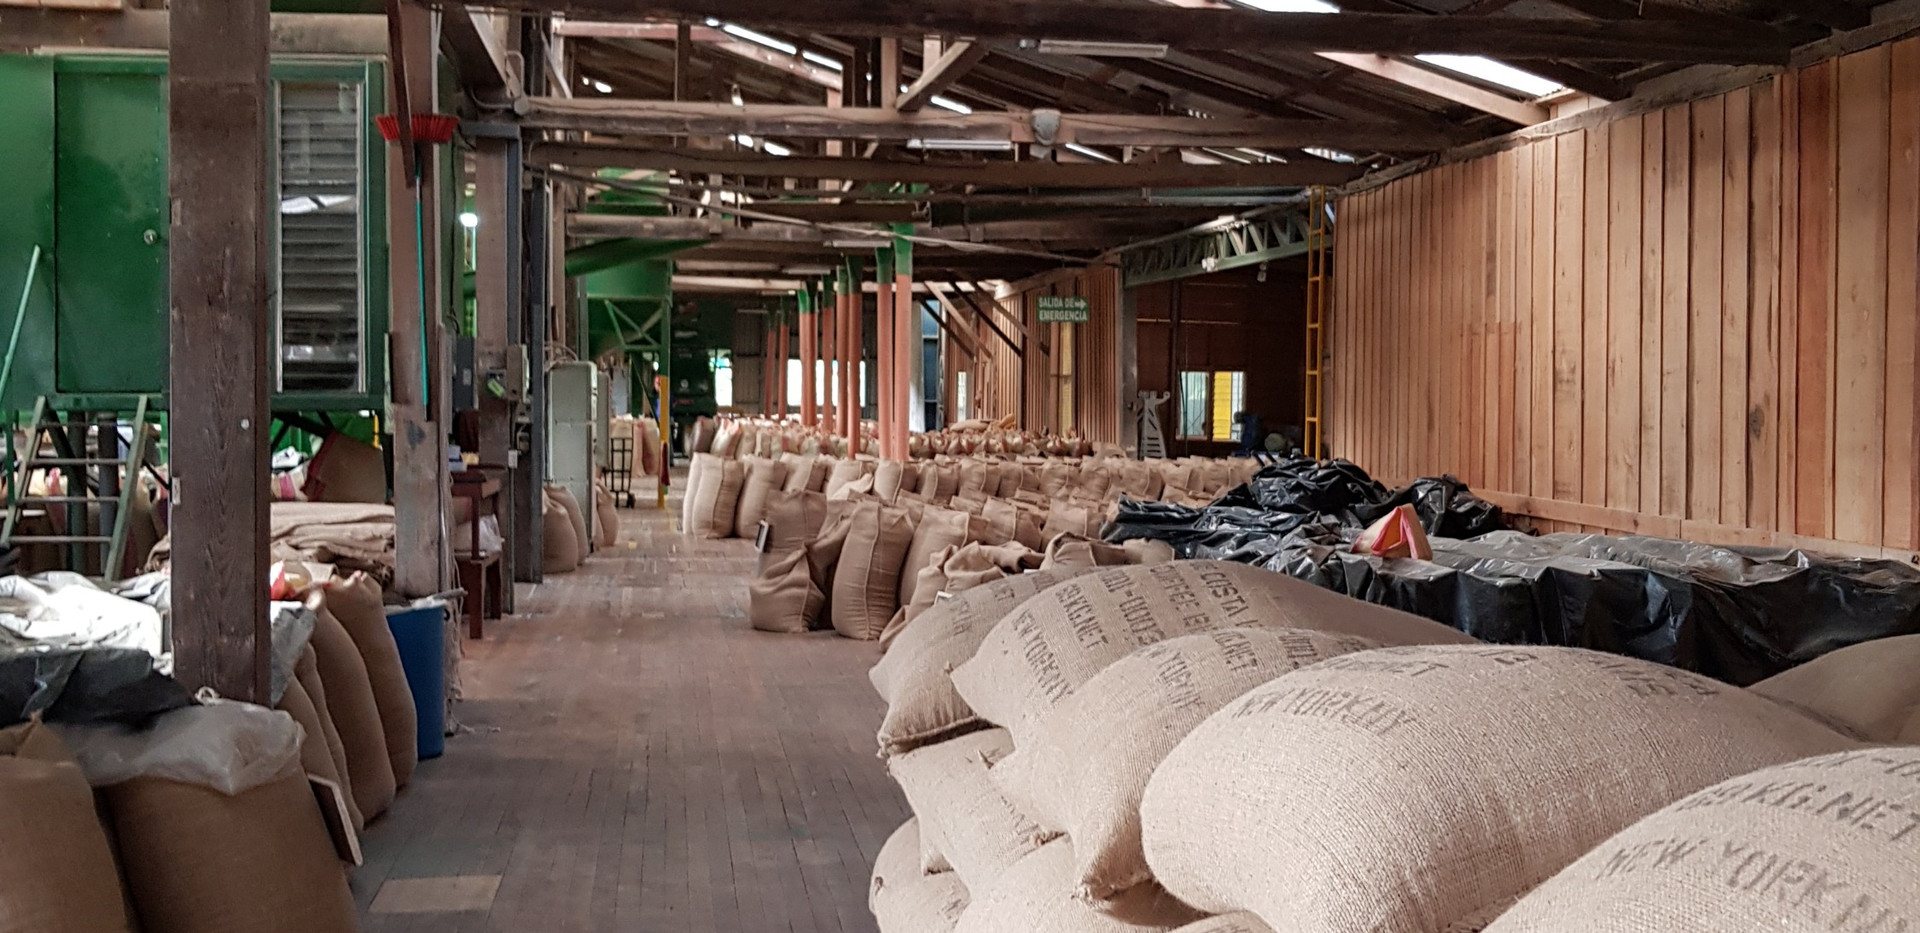 Green Coffee Warehouse